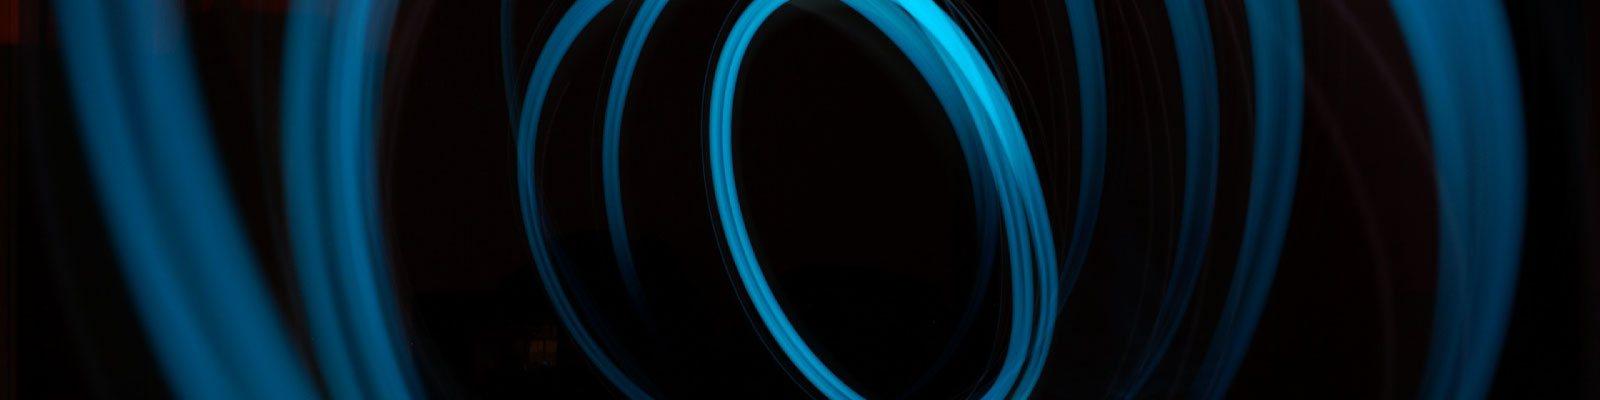 blue fiber optic strands swirling on black background